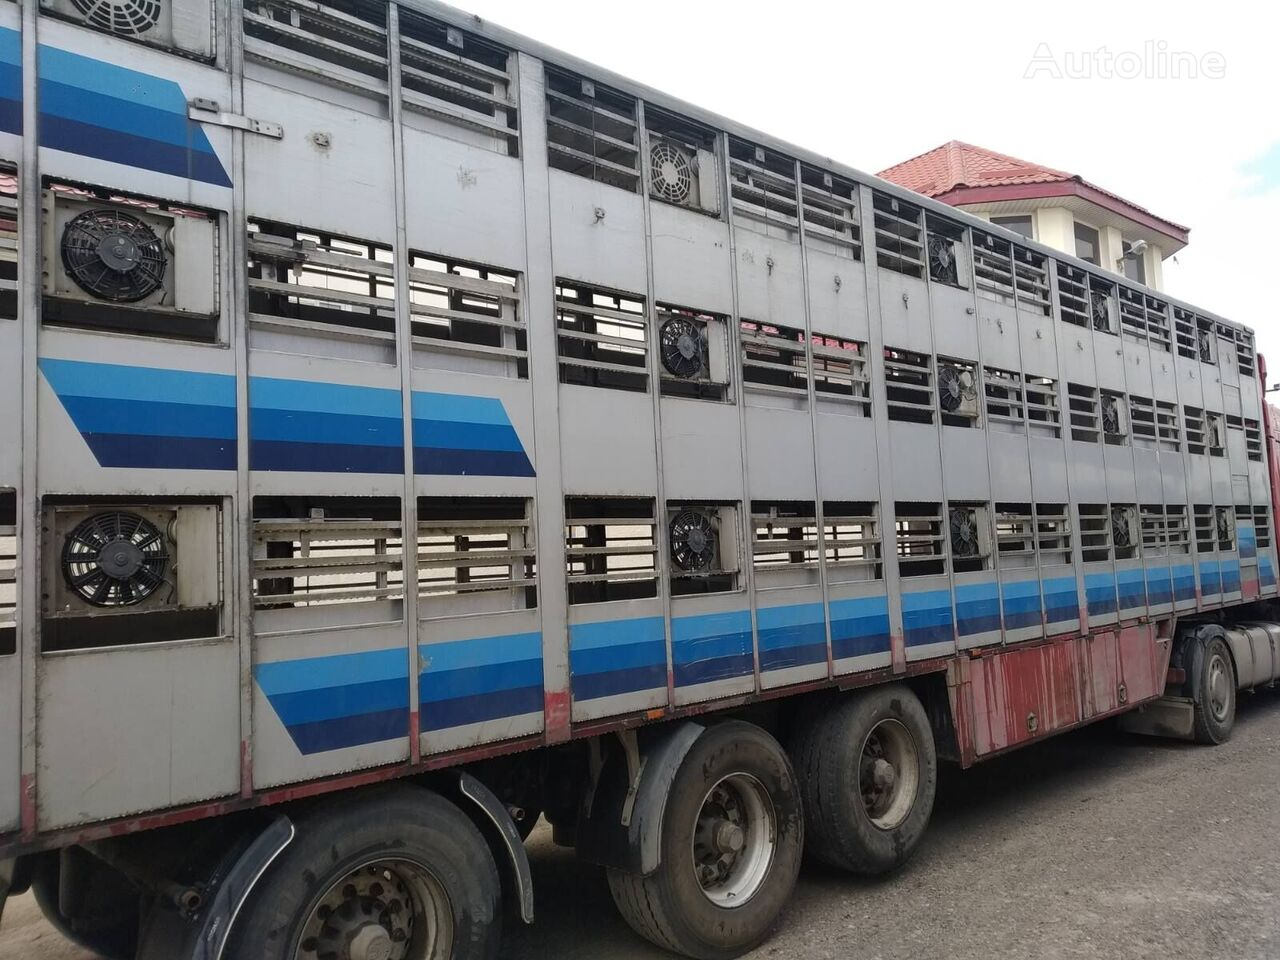 CUPPERS LVO 12 livestock semi-trailer